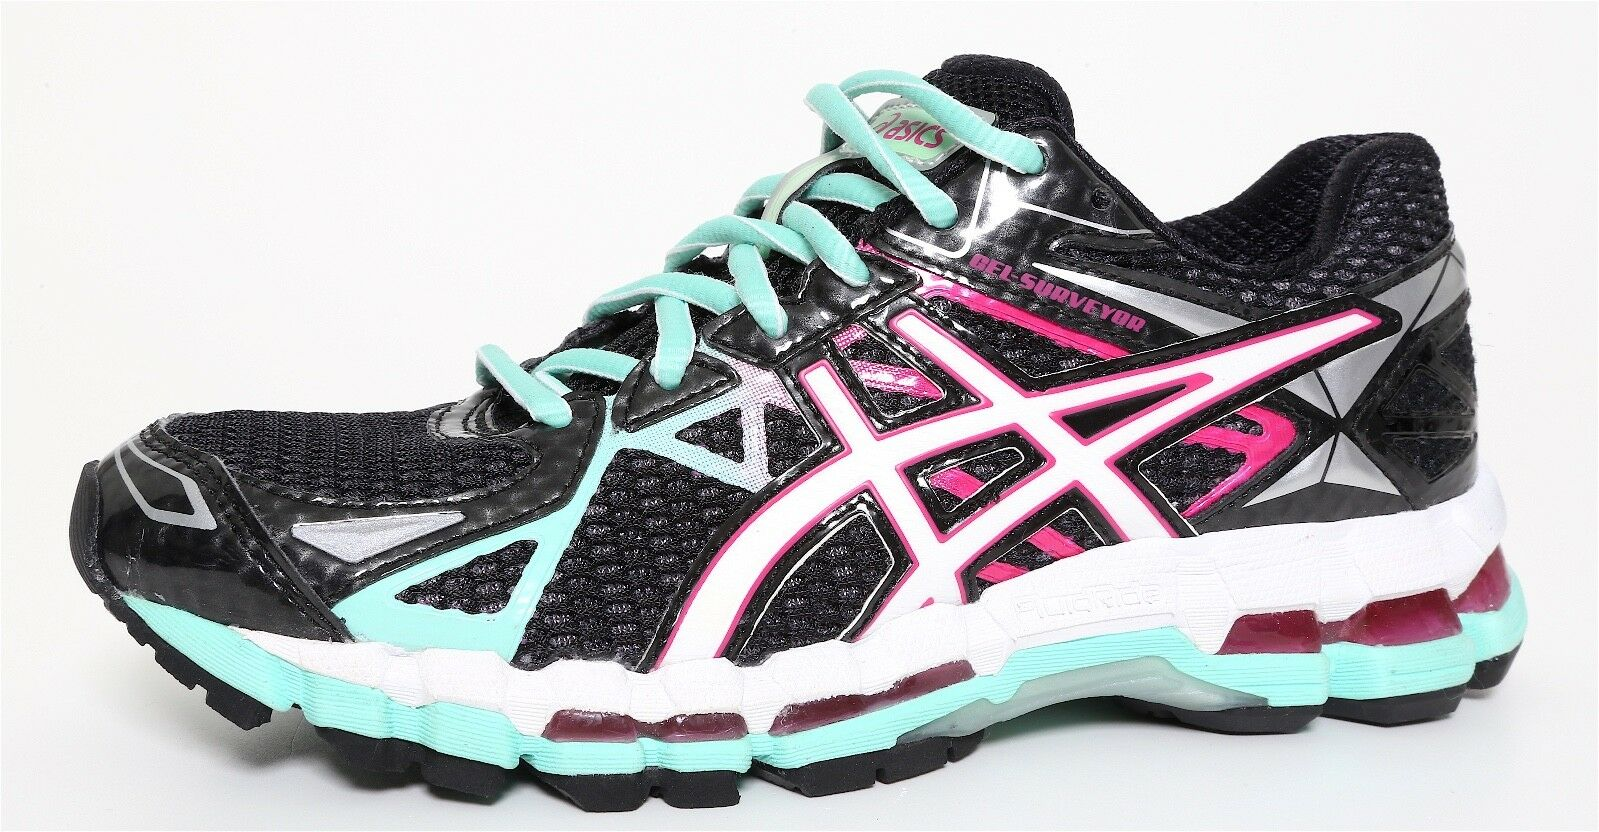 Asics GEL Surveyor 3 Running Shoes Multi Color Women Sz 6 7936